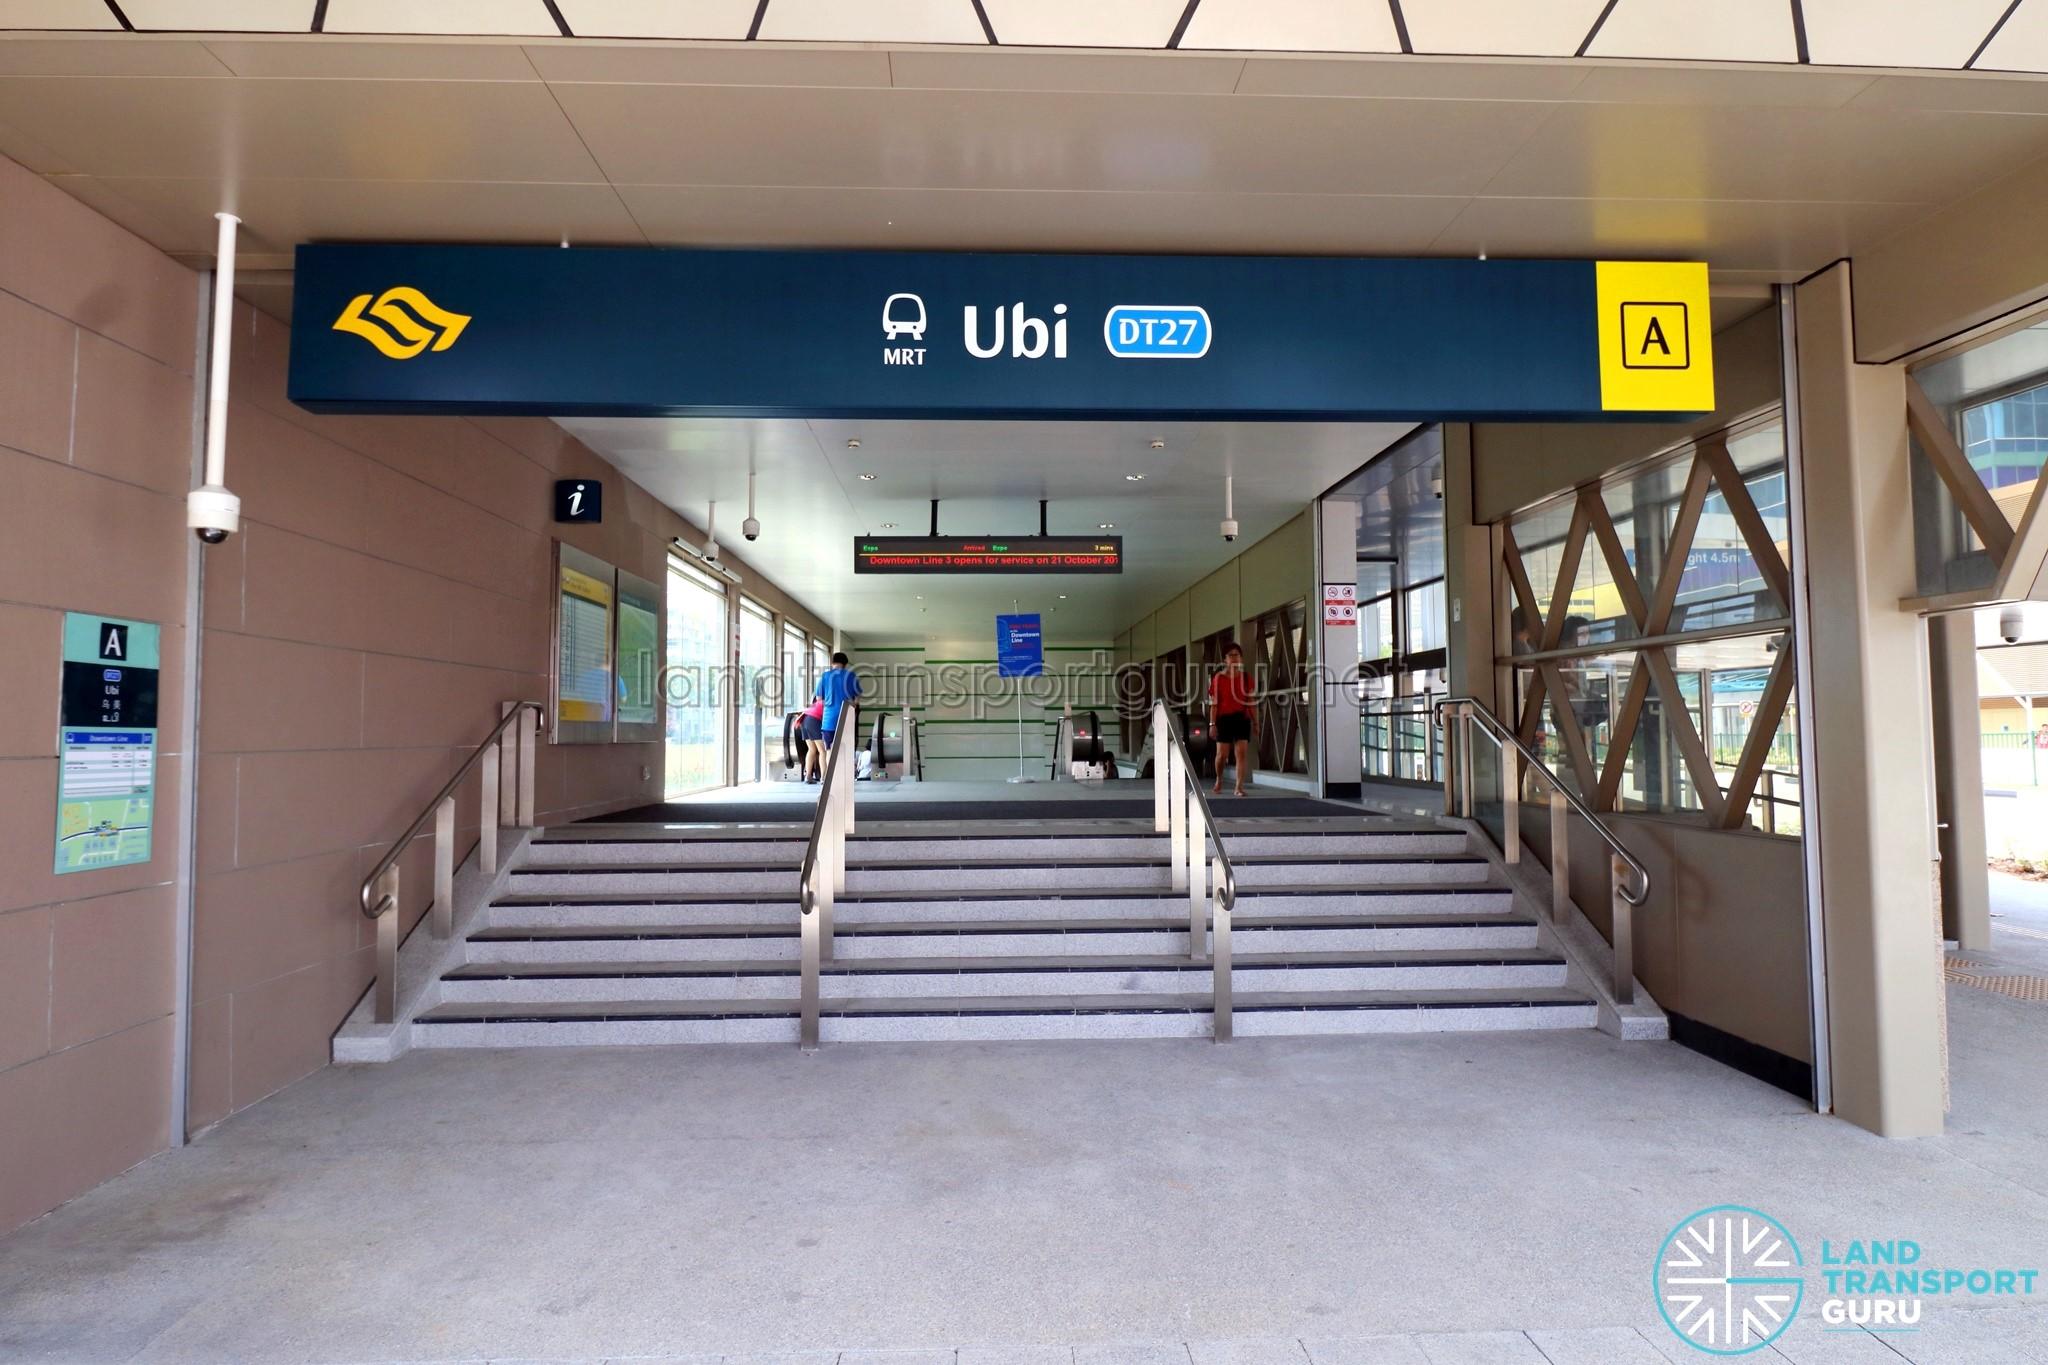 Ubi MRT Station Exit A